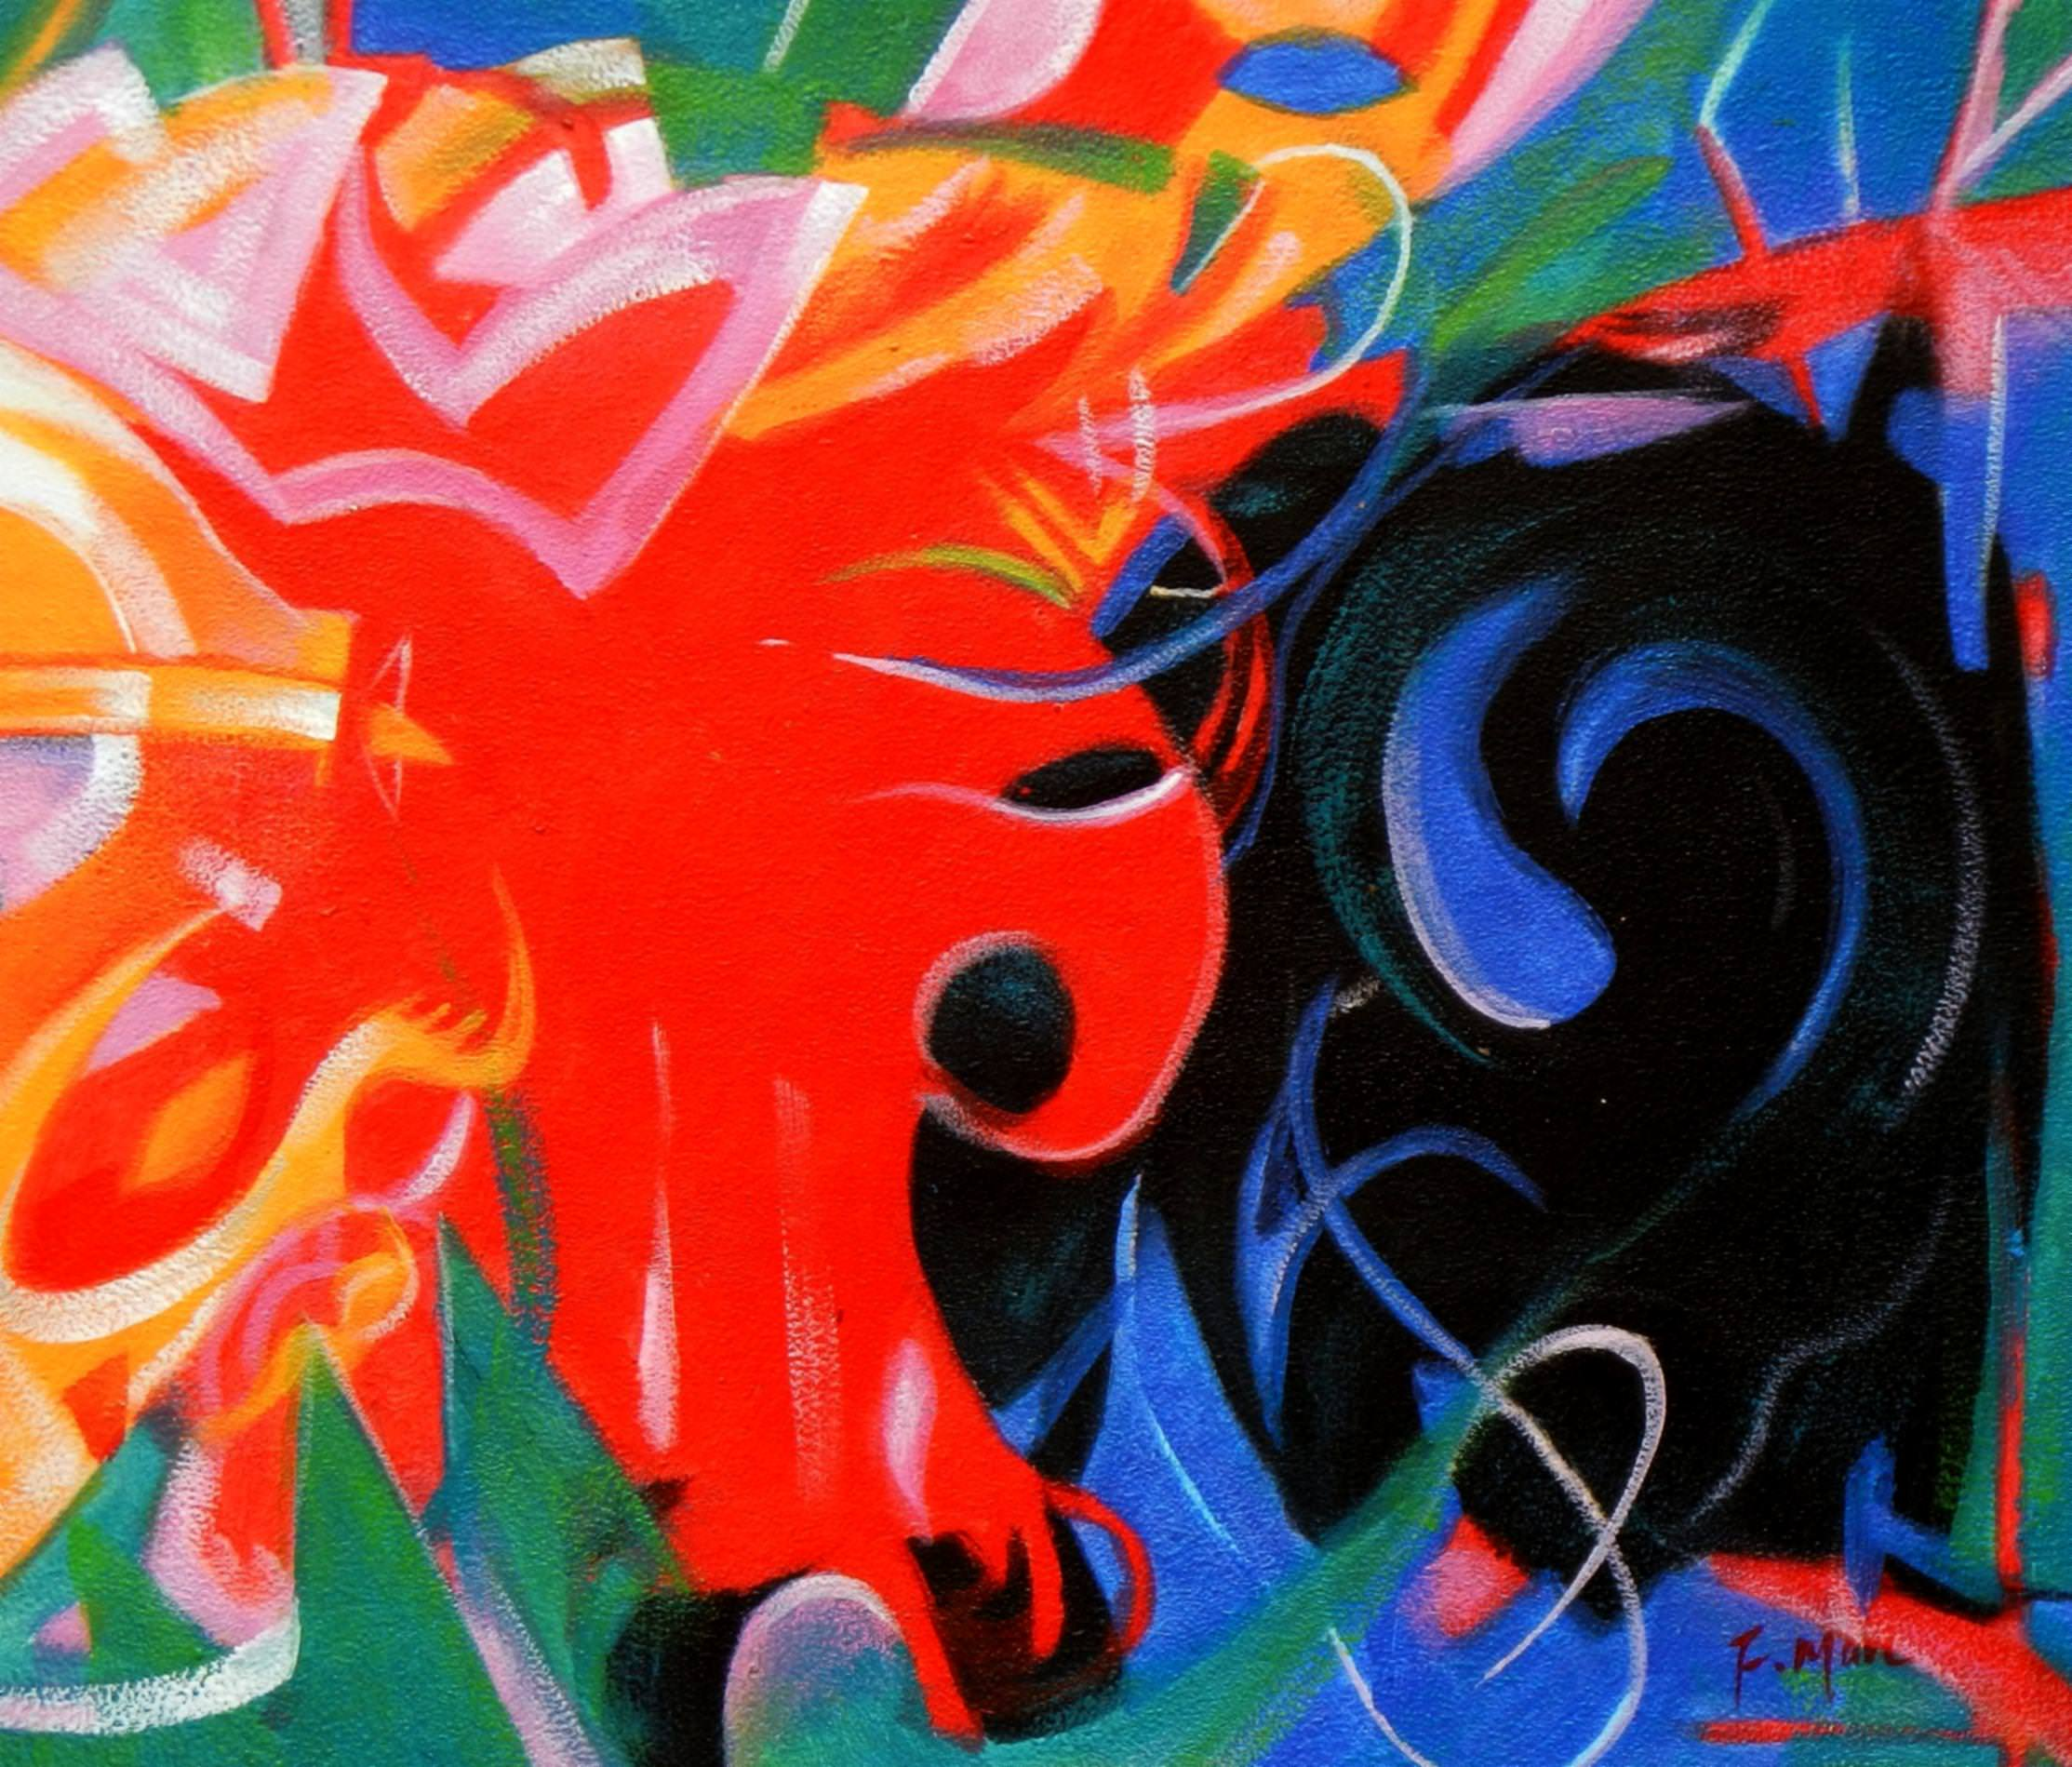 Franz Marc - Fighting Forms c93343 50x60cm Expressionismus Ölgemälde